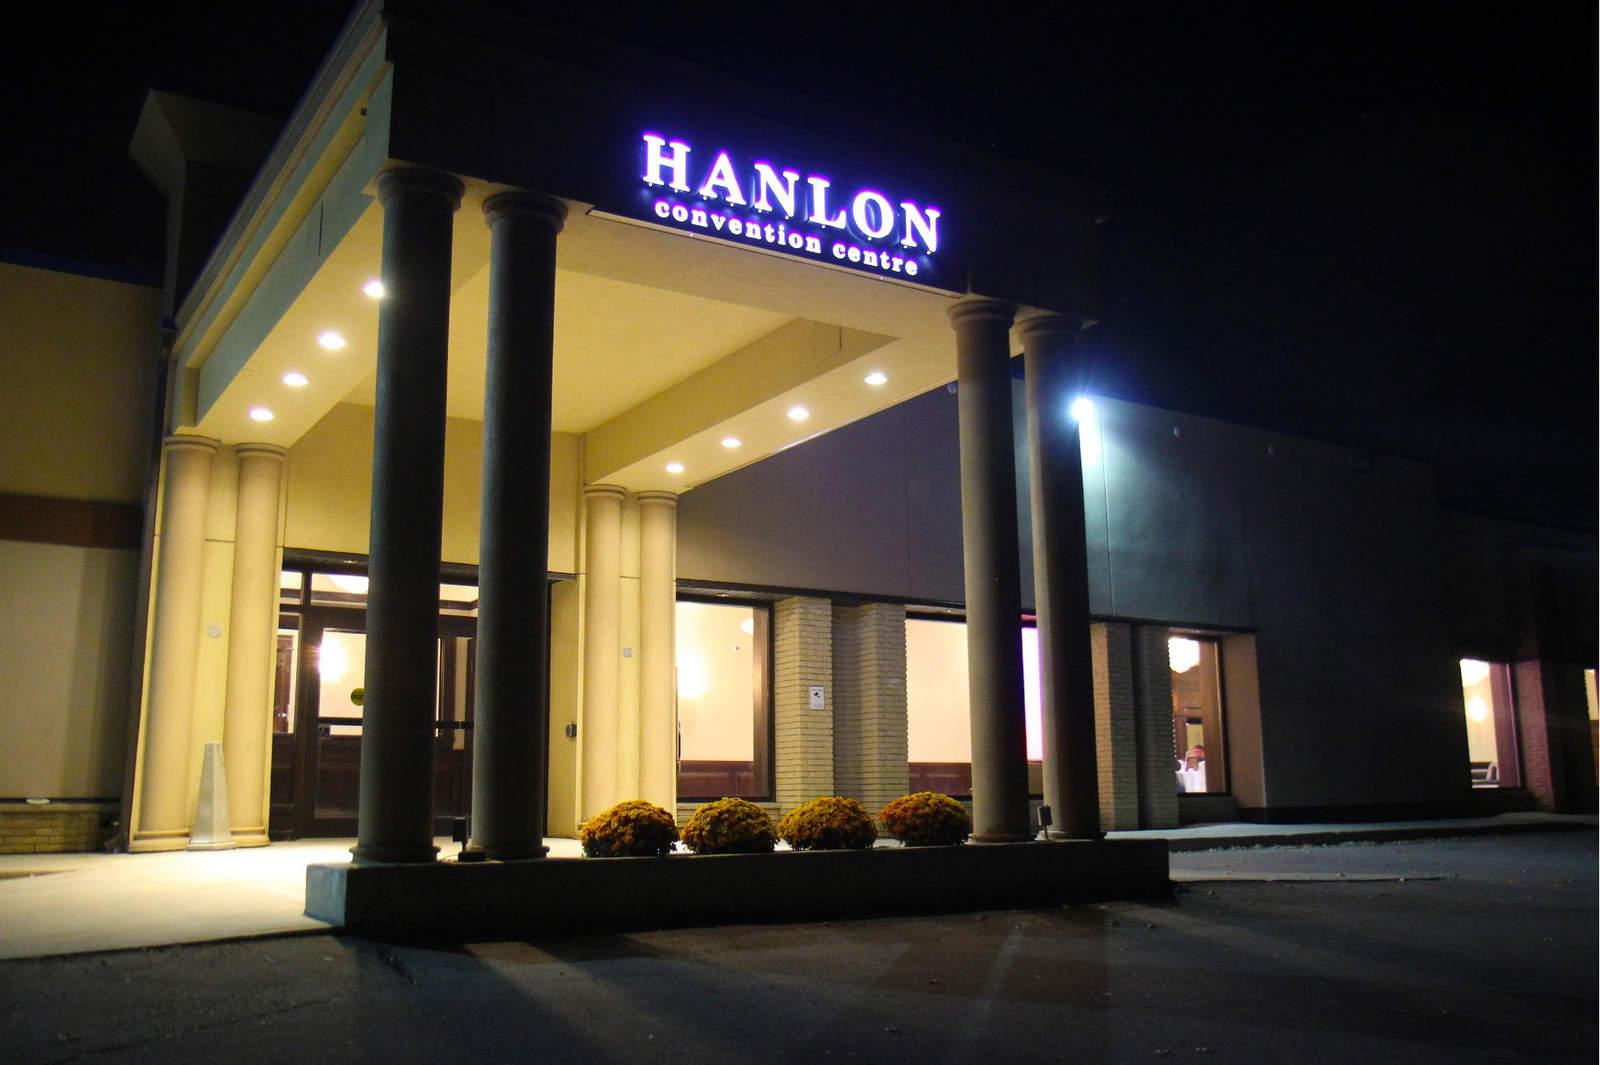 Read more about the article Hanlon Convention Centre   Guelph